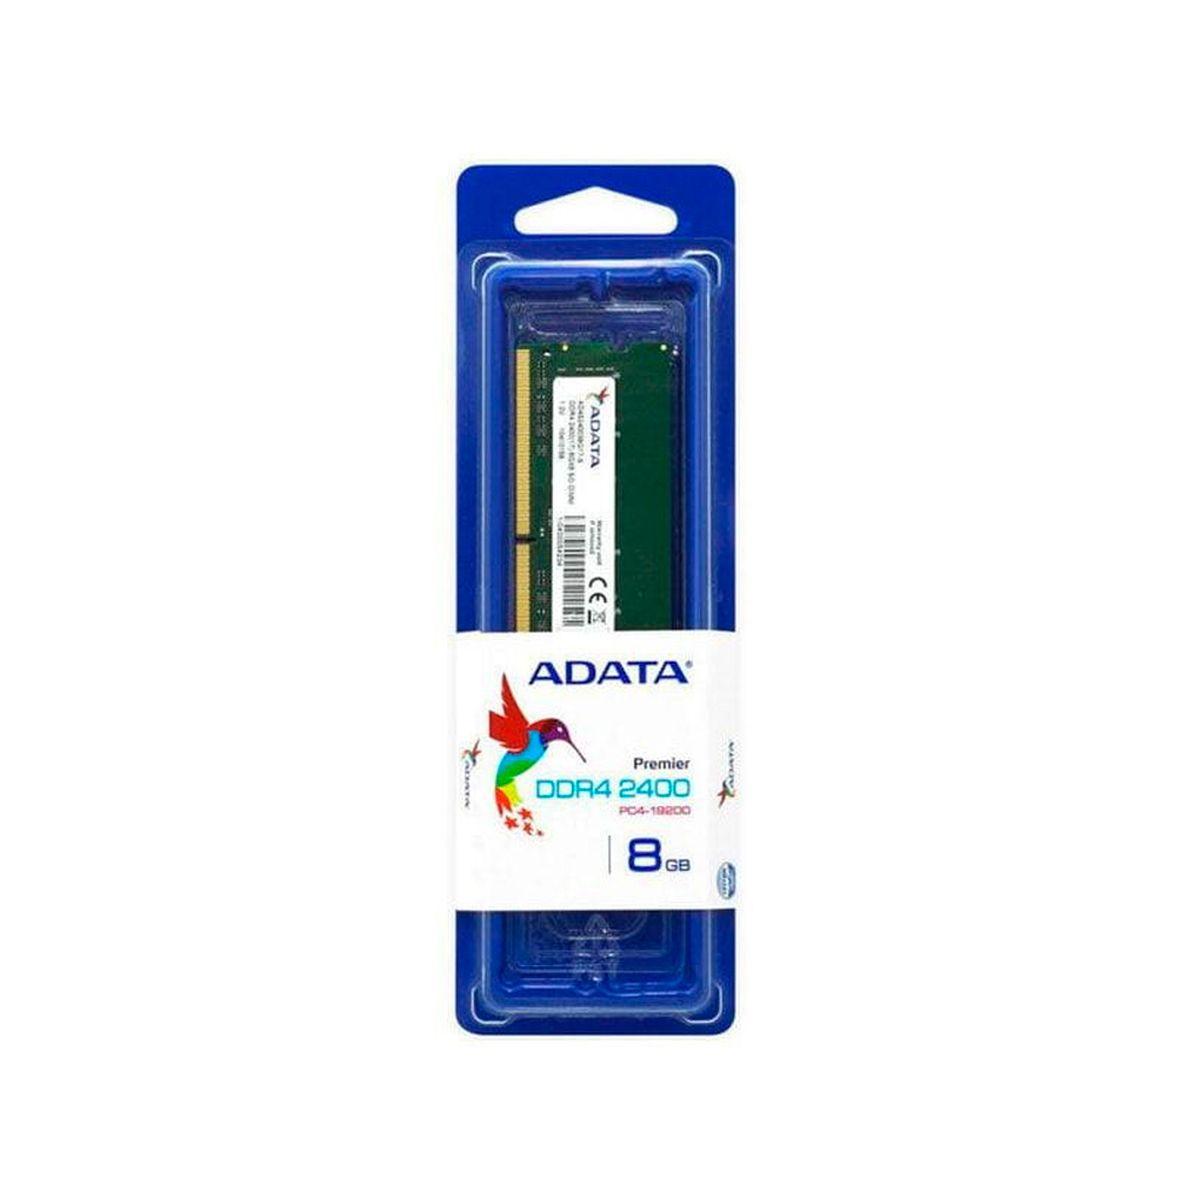 Memória Adata para Notebook, 8GB, DDR4, 2400MHz, PC4-19200, SODIMM - AD4S240038G17-S